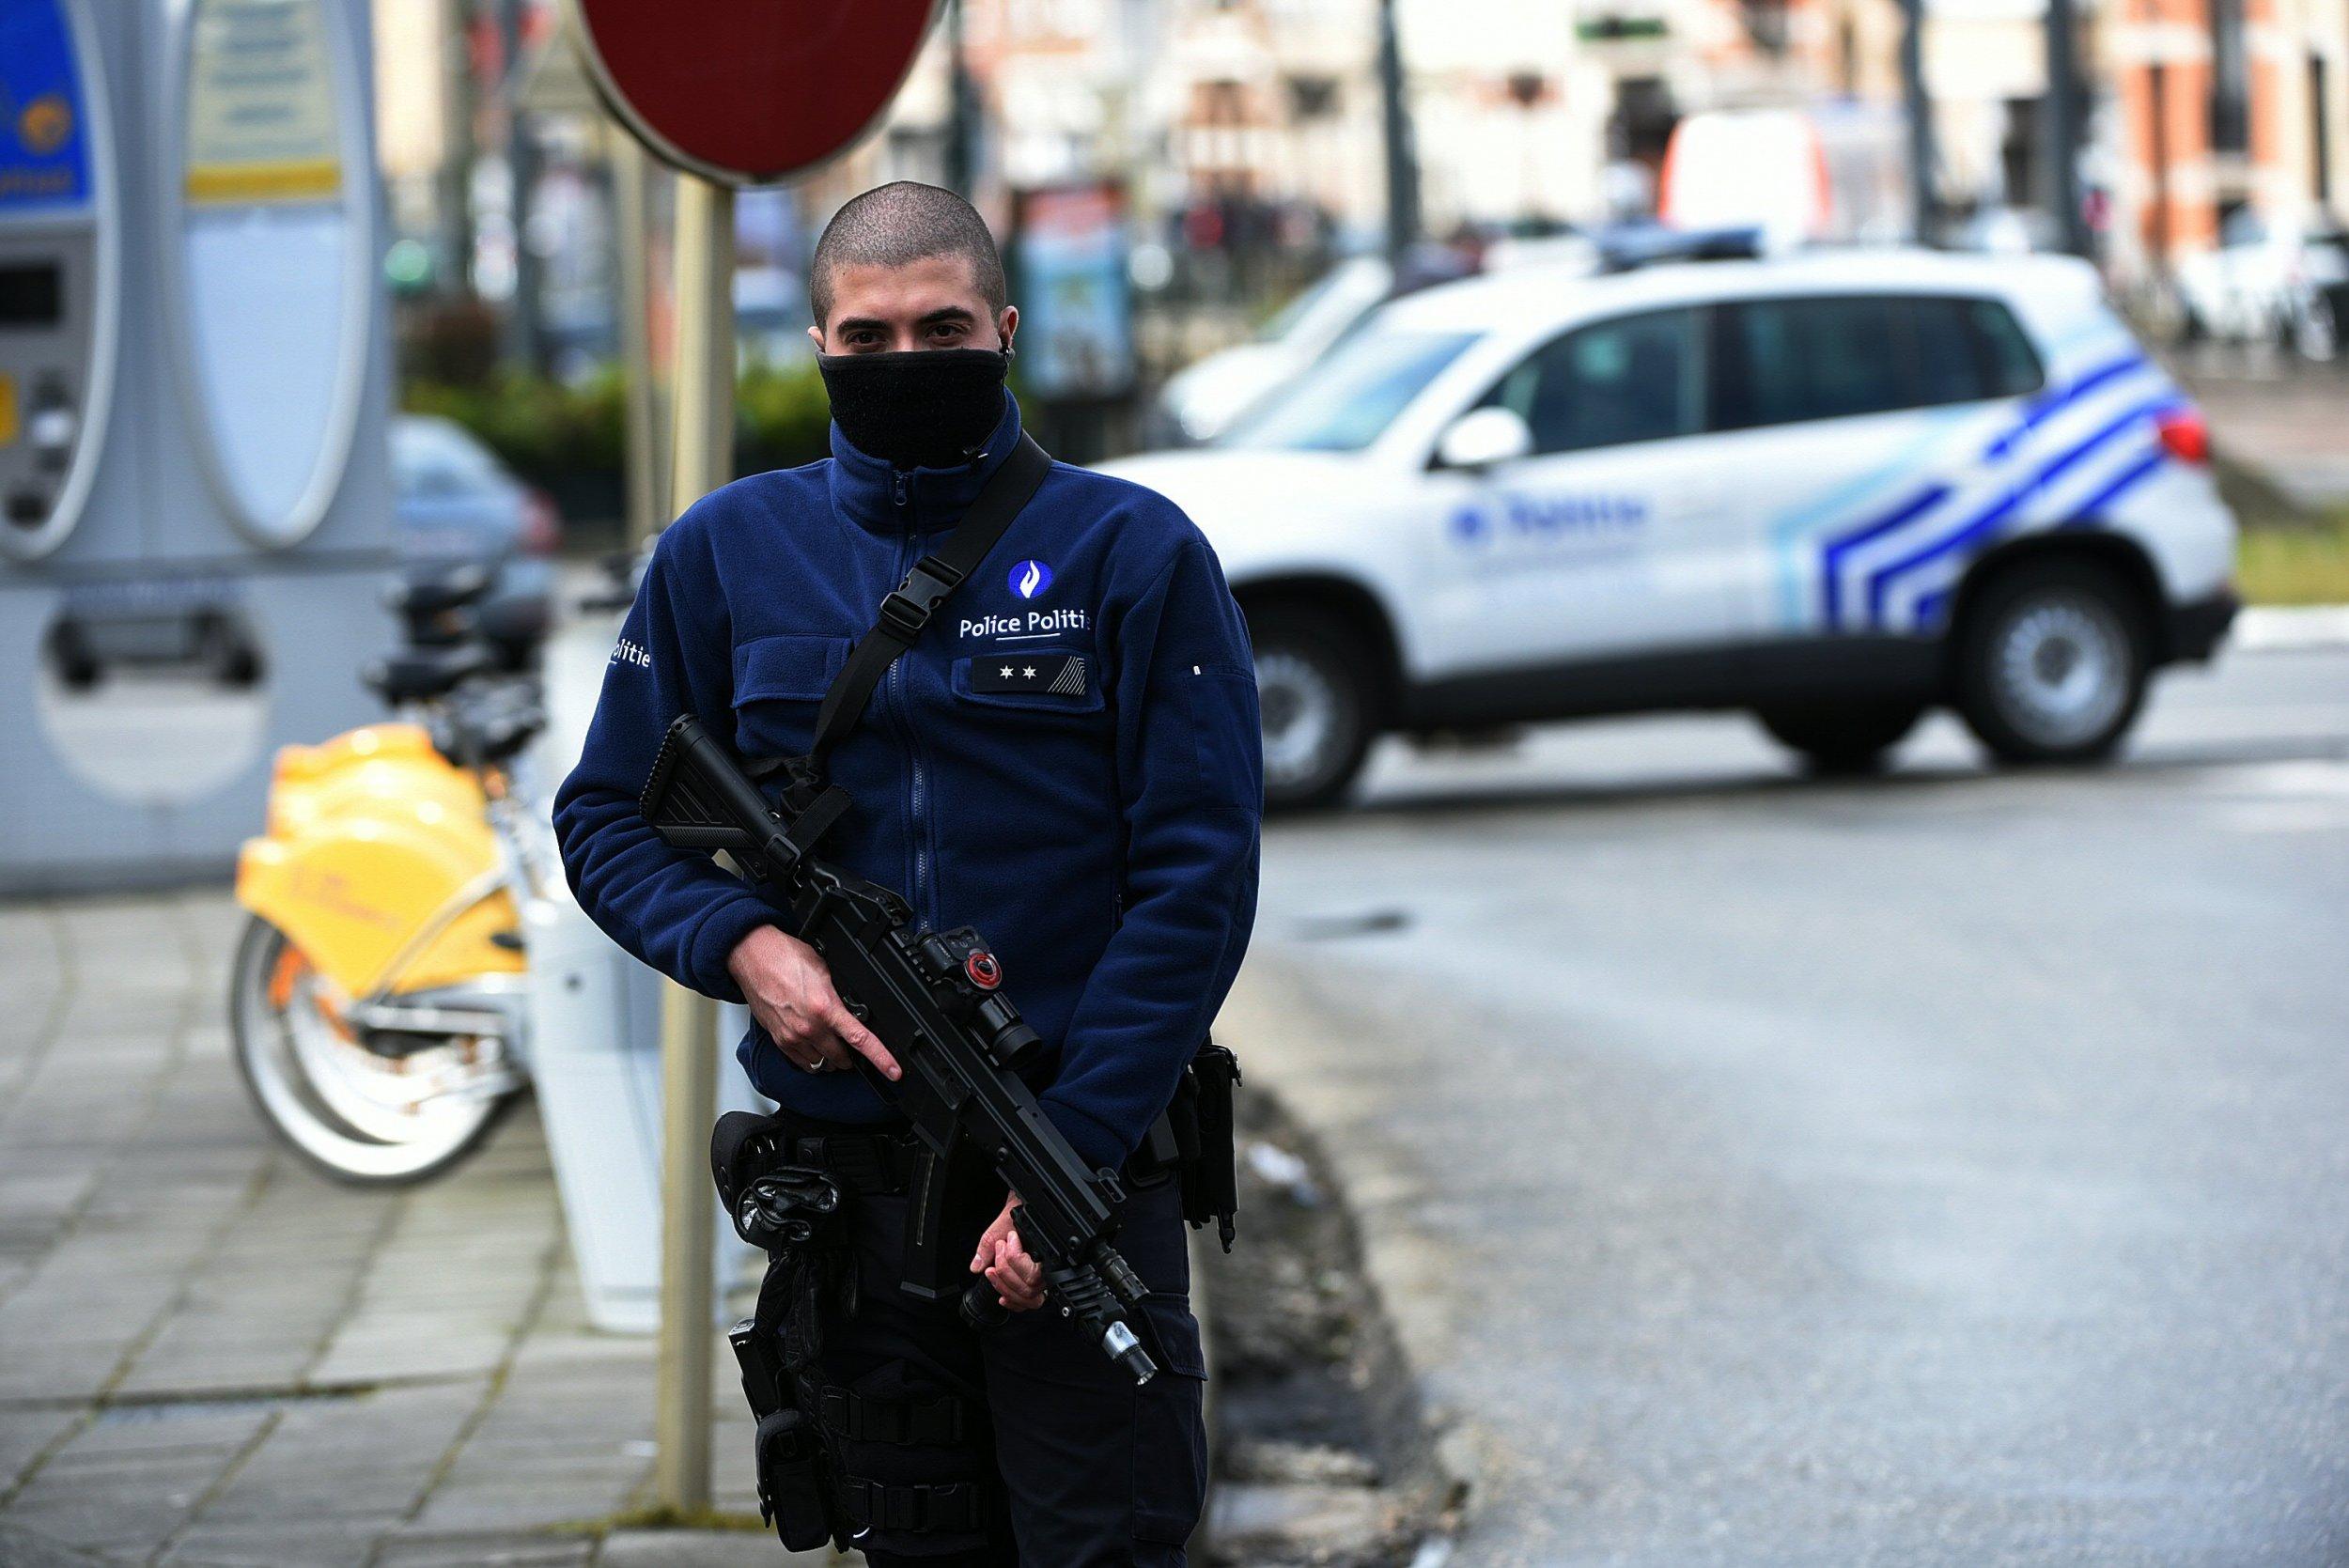 Brussels Schaerbeek operation